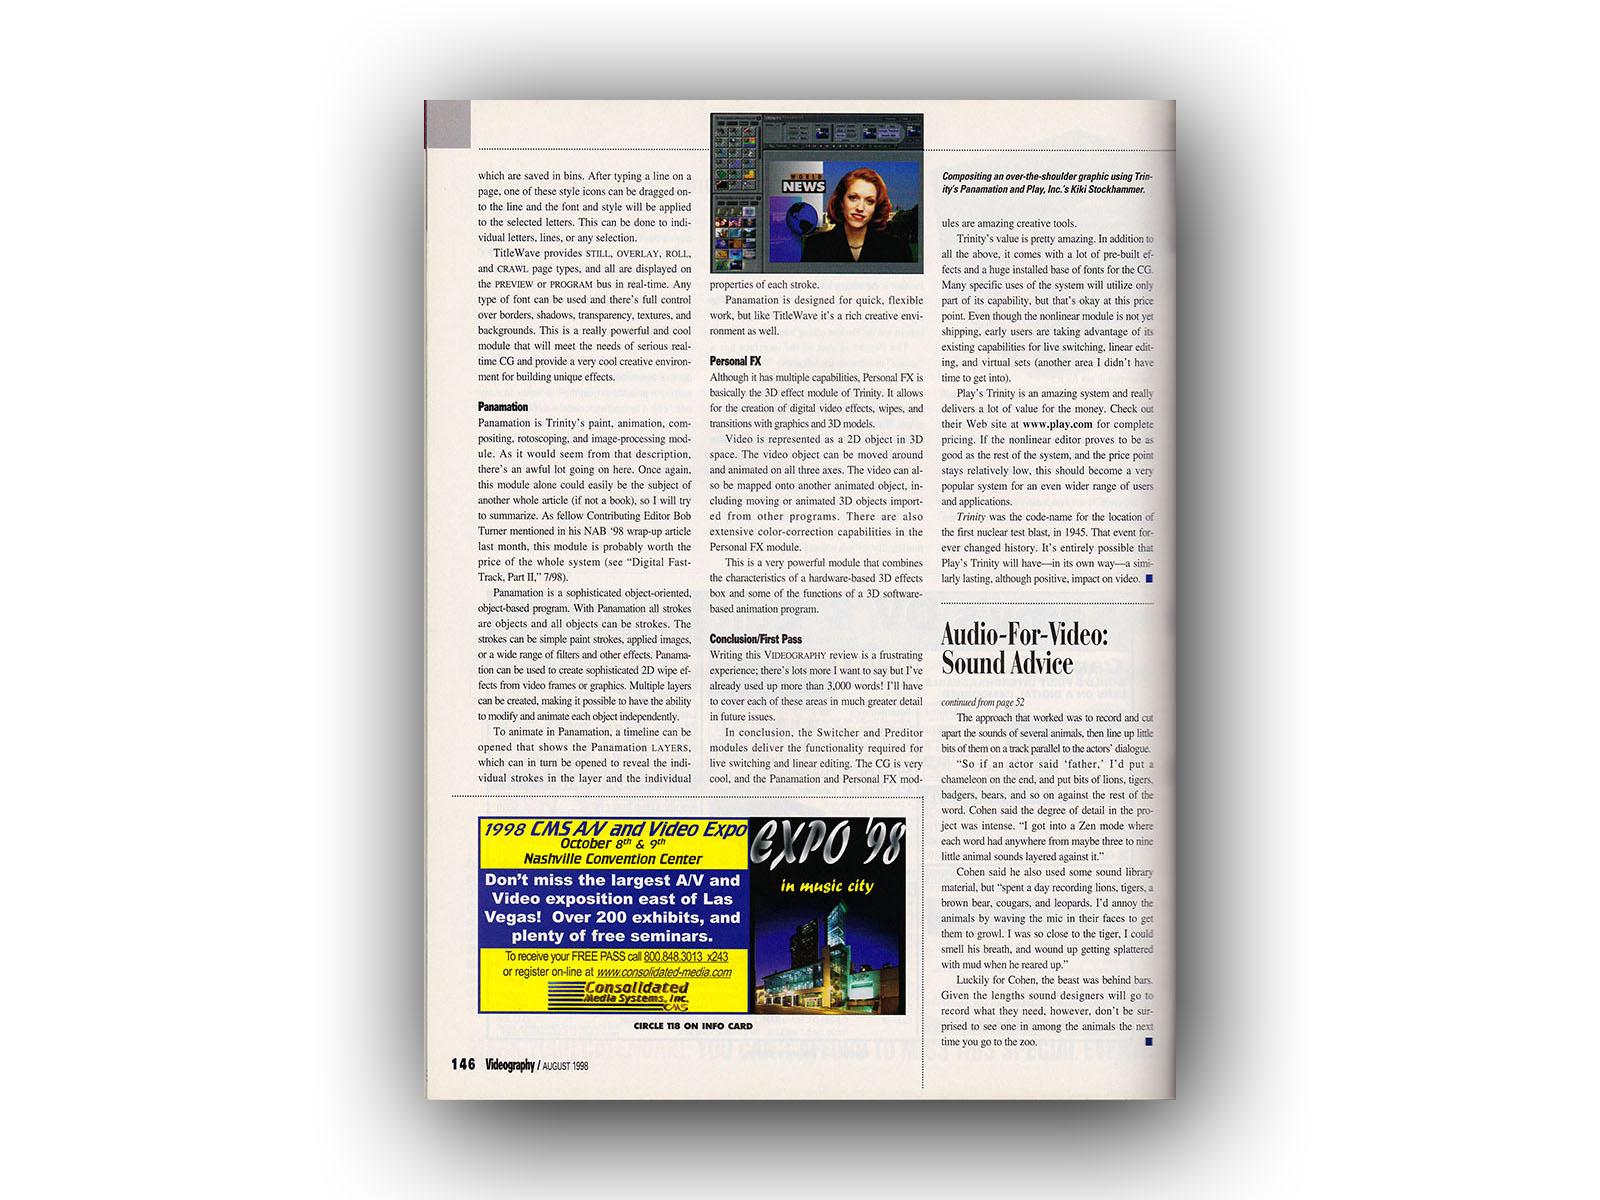 _0006_MagazineVideography-Fall98-P146-web.jpg